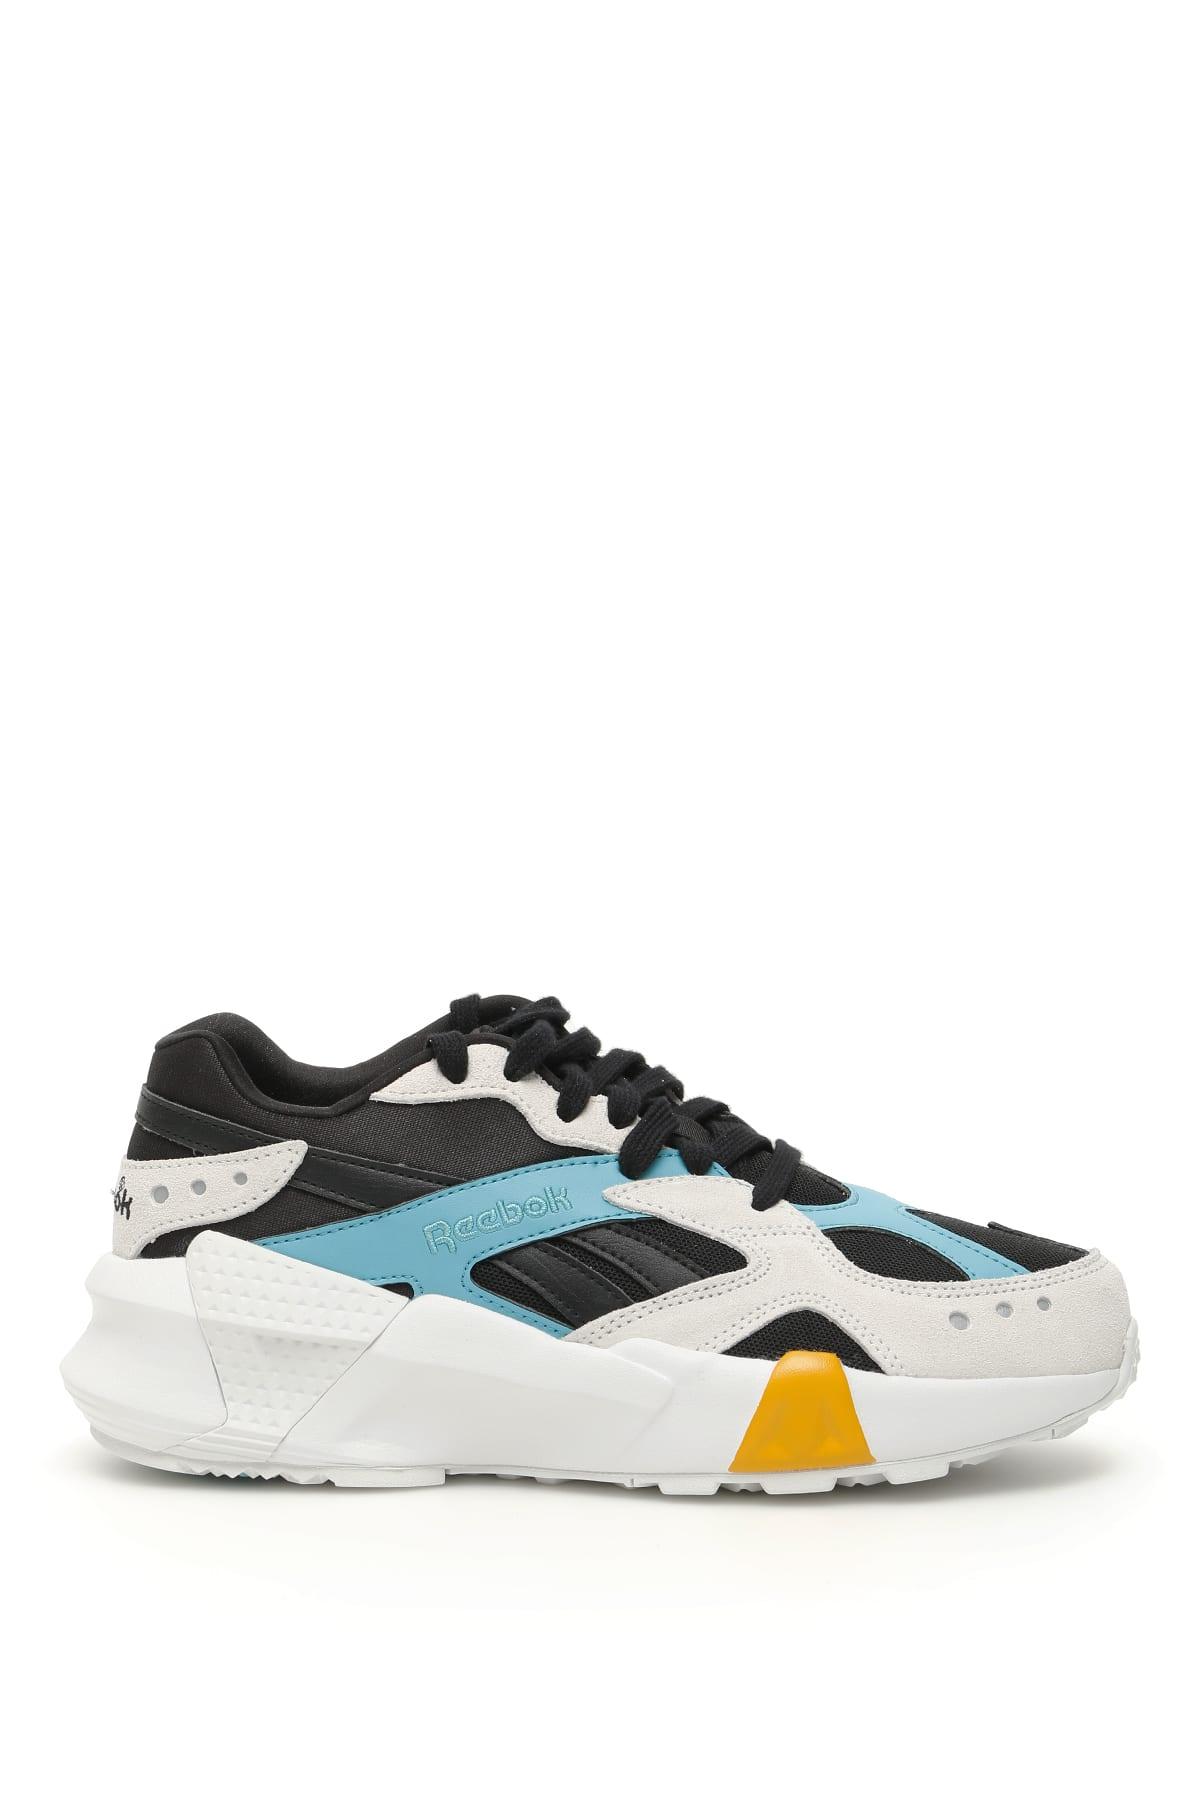 c6ef4a14 Reebok Gigi Hadid Aztrek Double 93 Sneakers